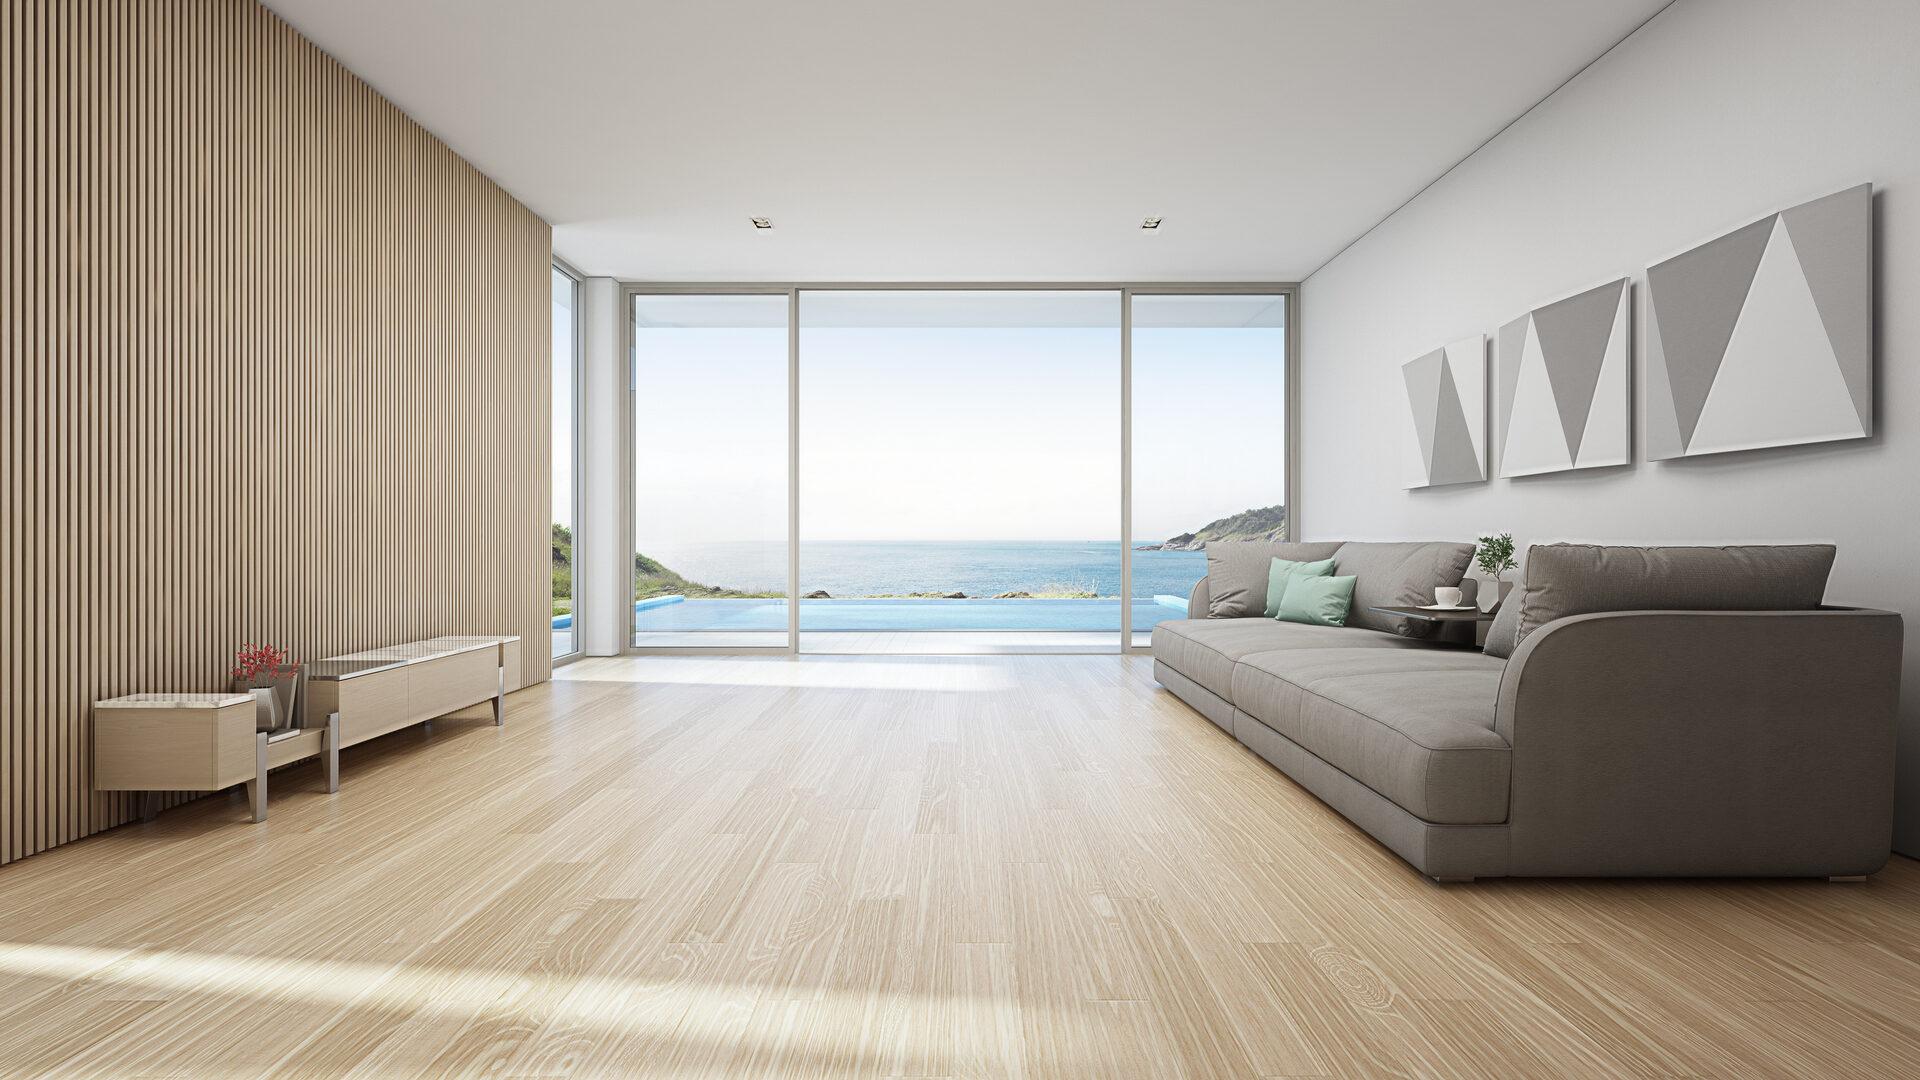 GID Flooring